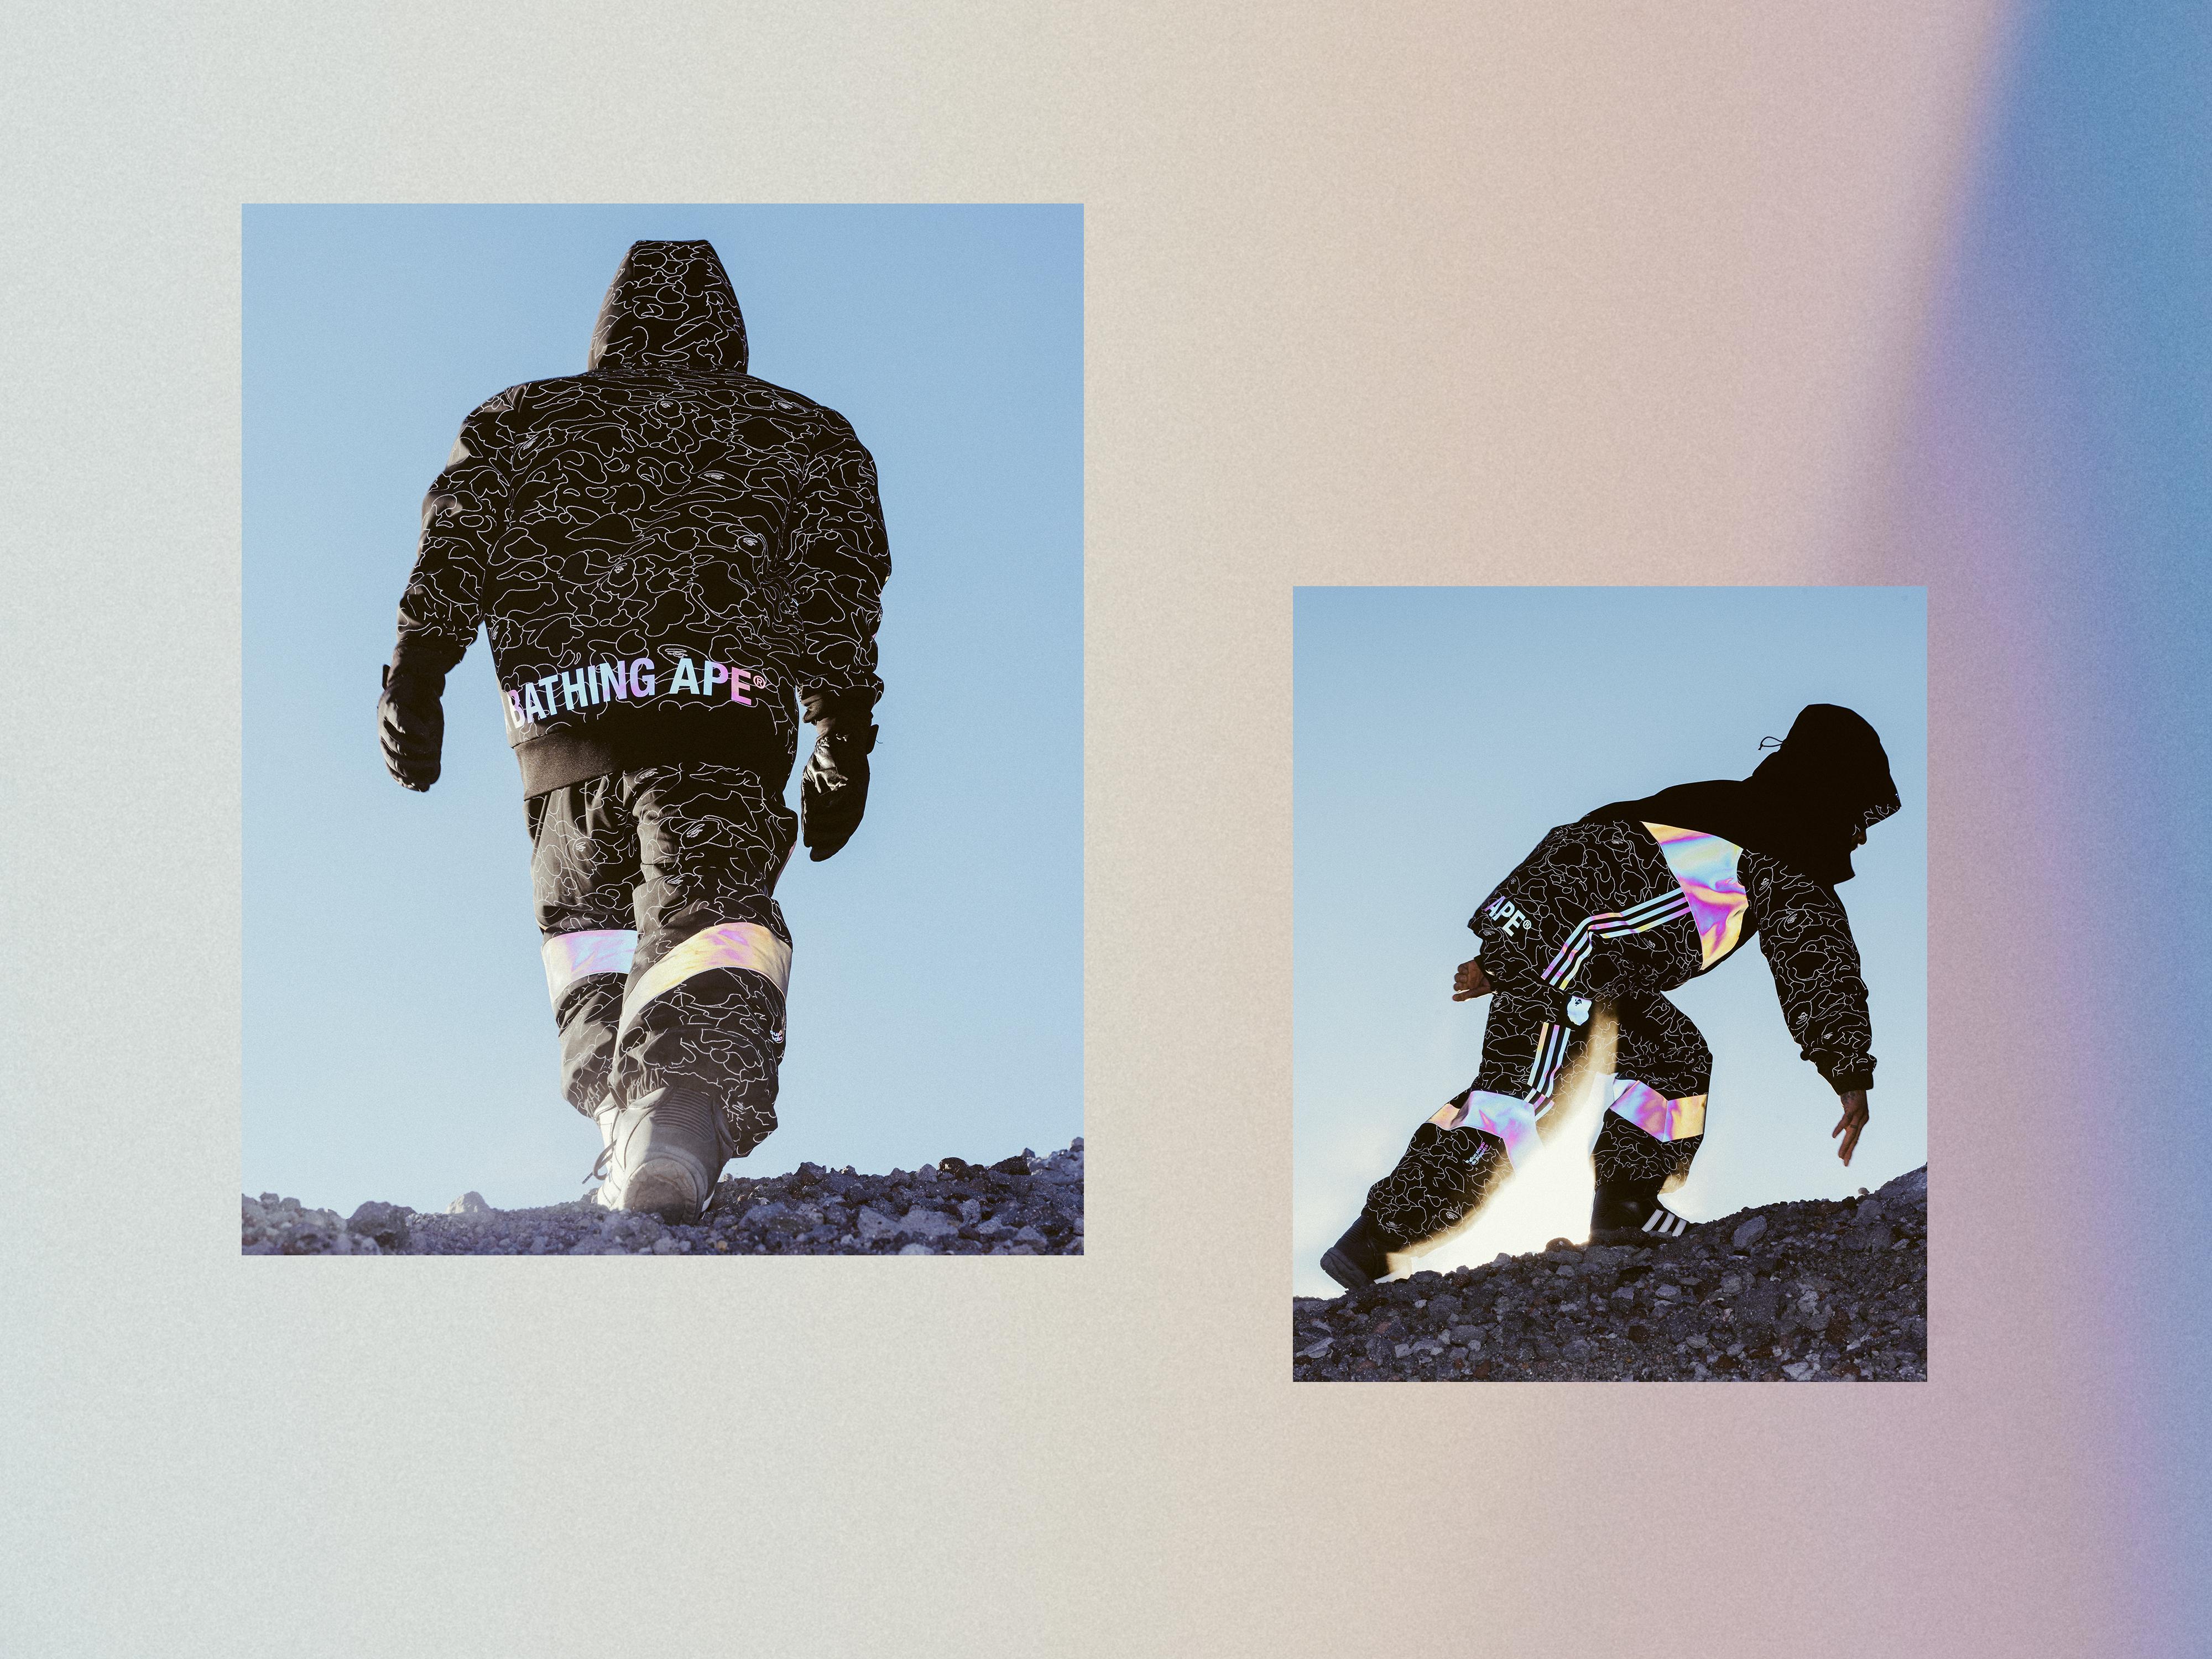 adidas_Snowboarding_BAPEcollection_PR_2_4000x3000